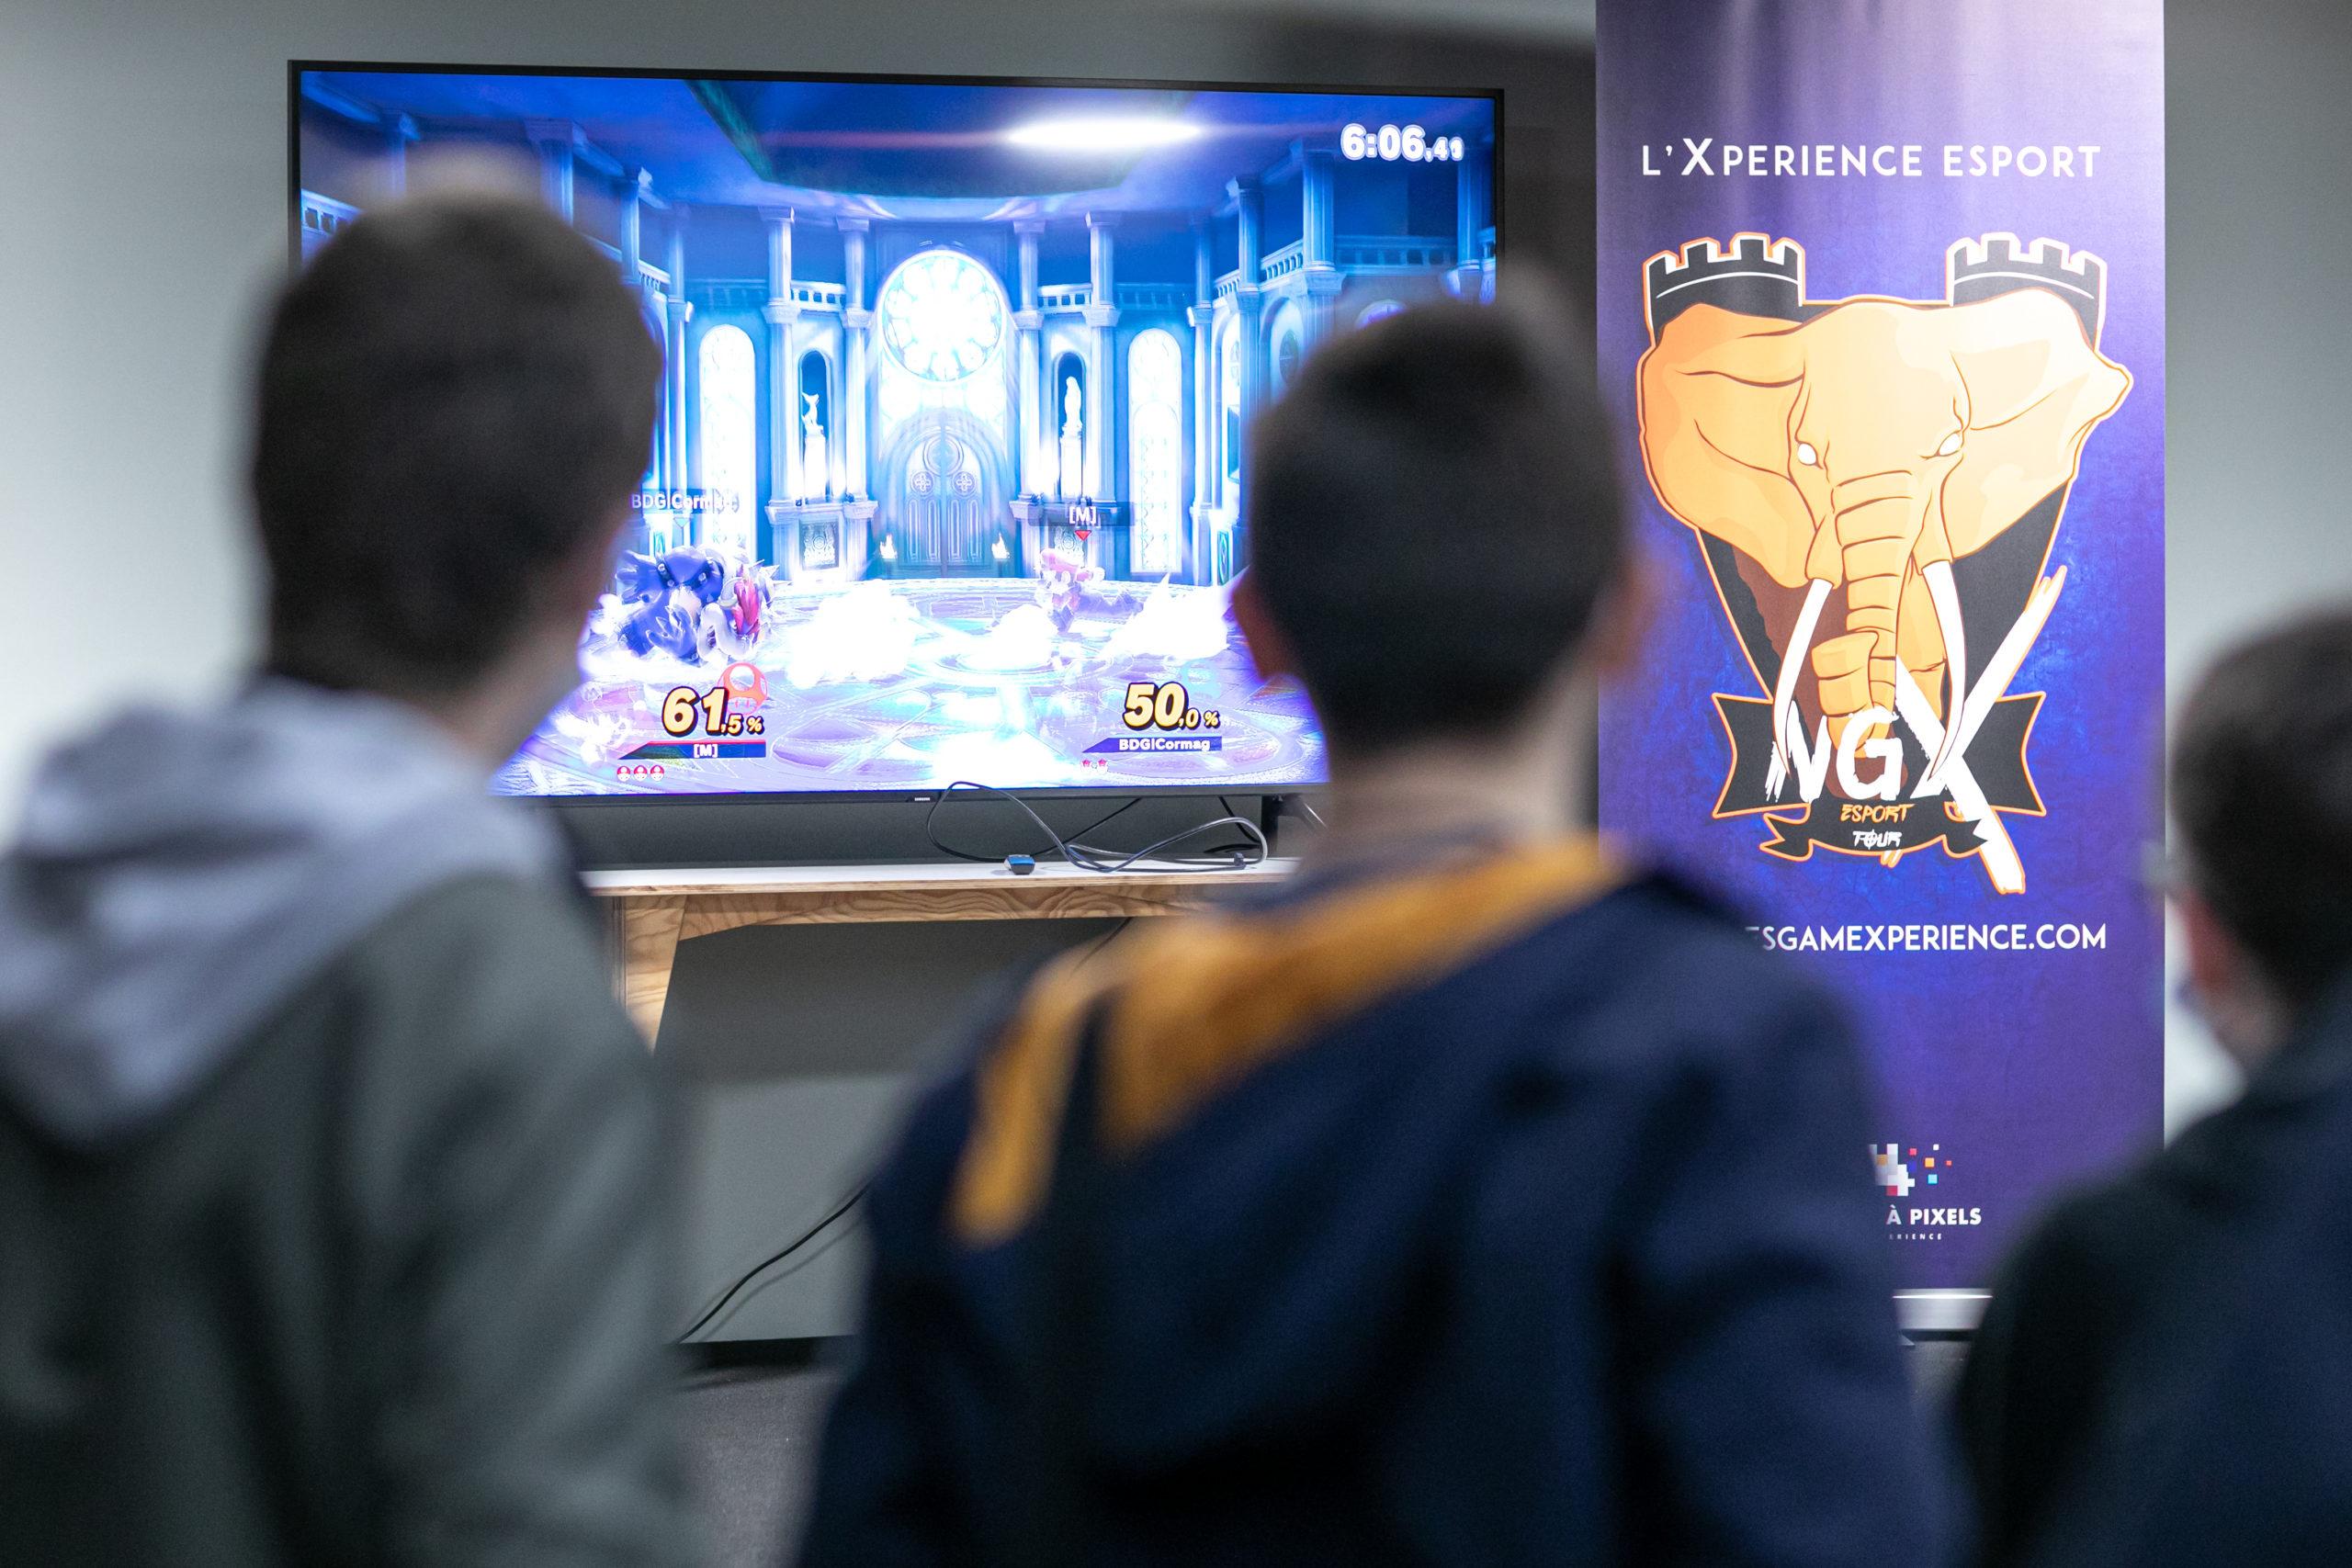 Nantes Game Xperience